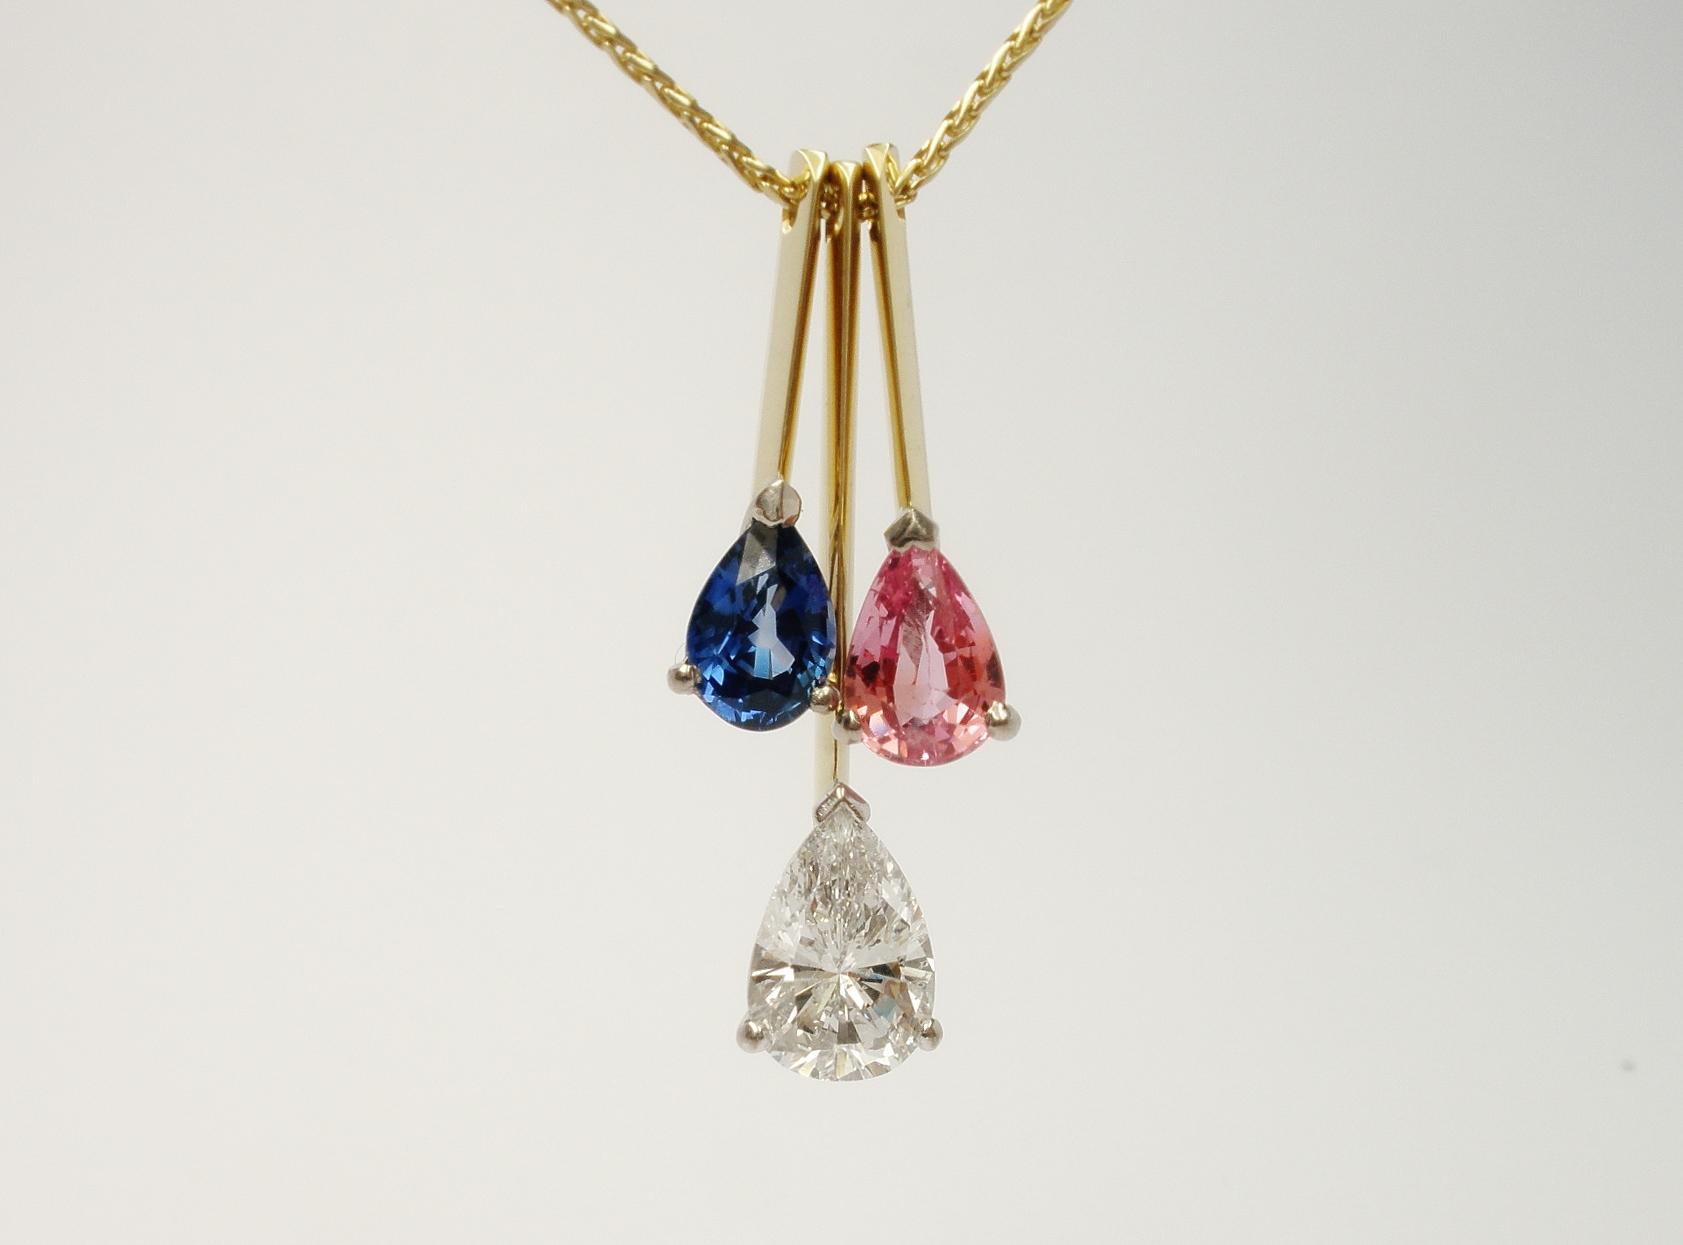 Tear drop shaped diamond,tear drop shaped pink sapphire & tear drop shaped blue sapphire triple 18ct. yellow gold pendulum style pendant.